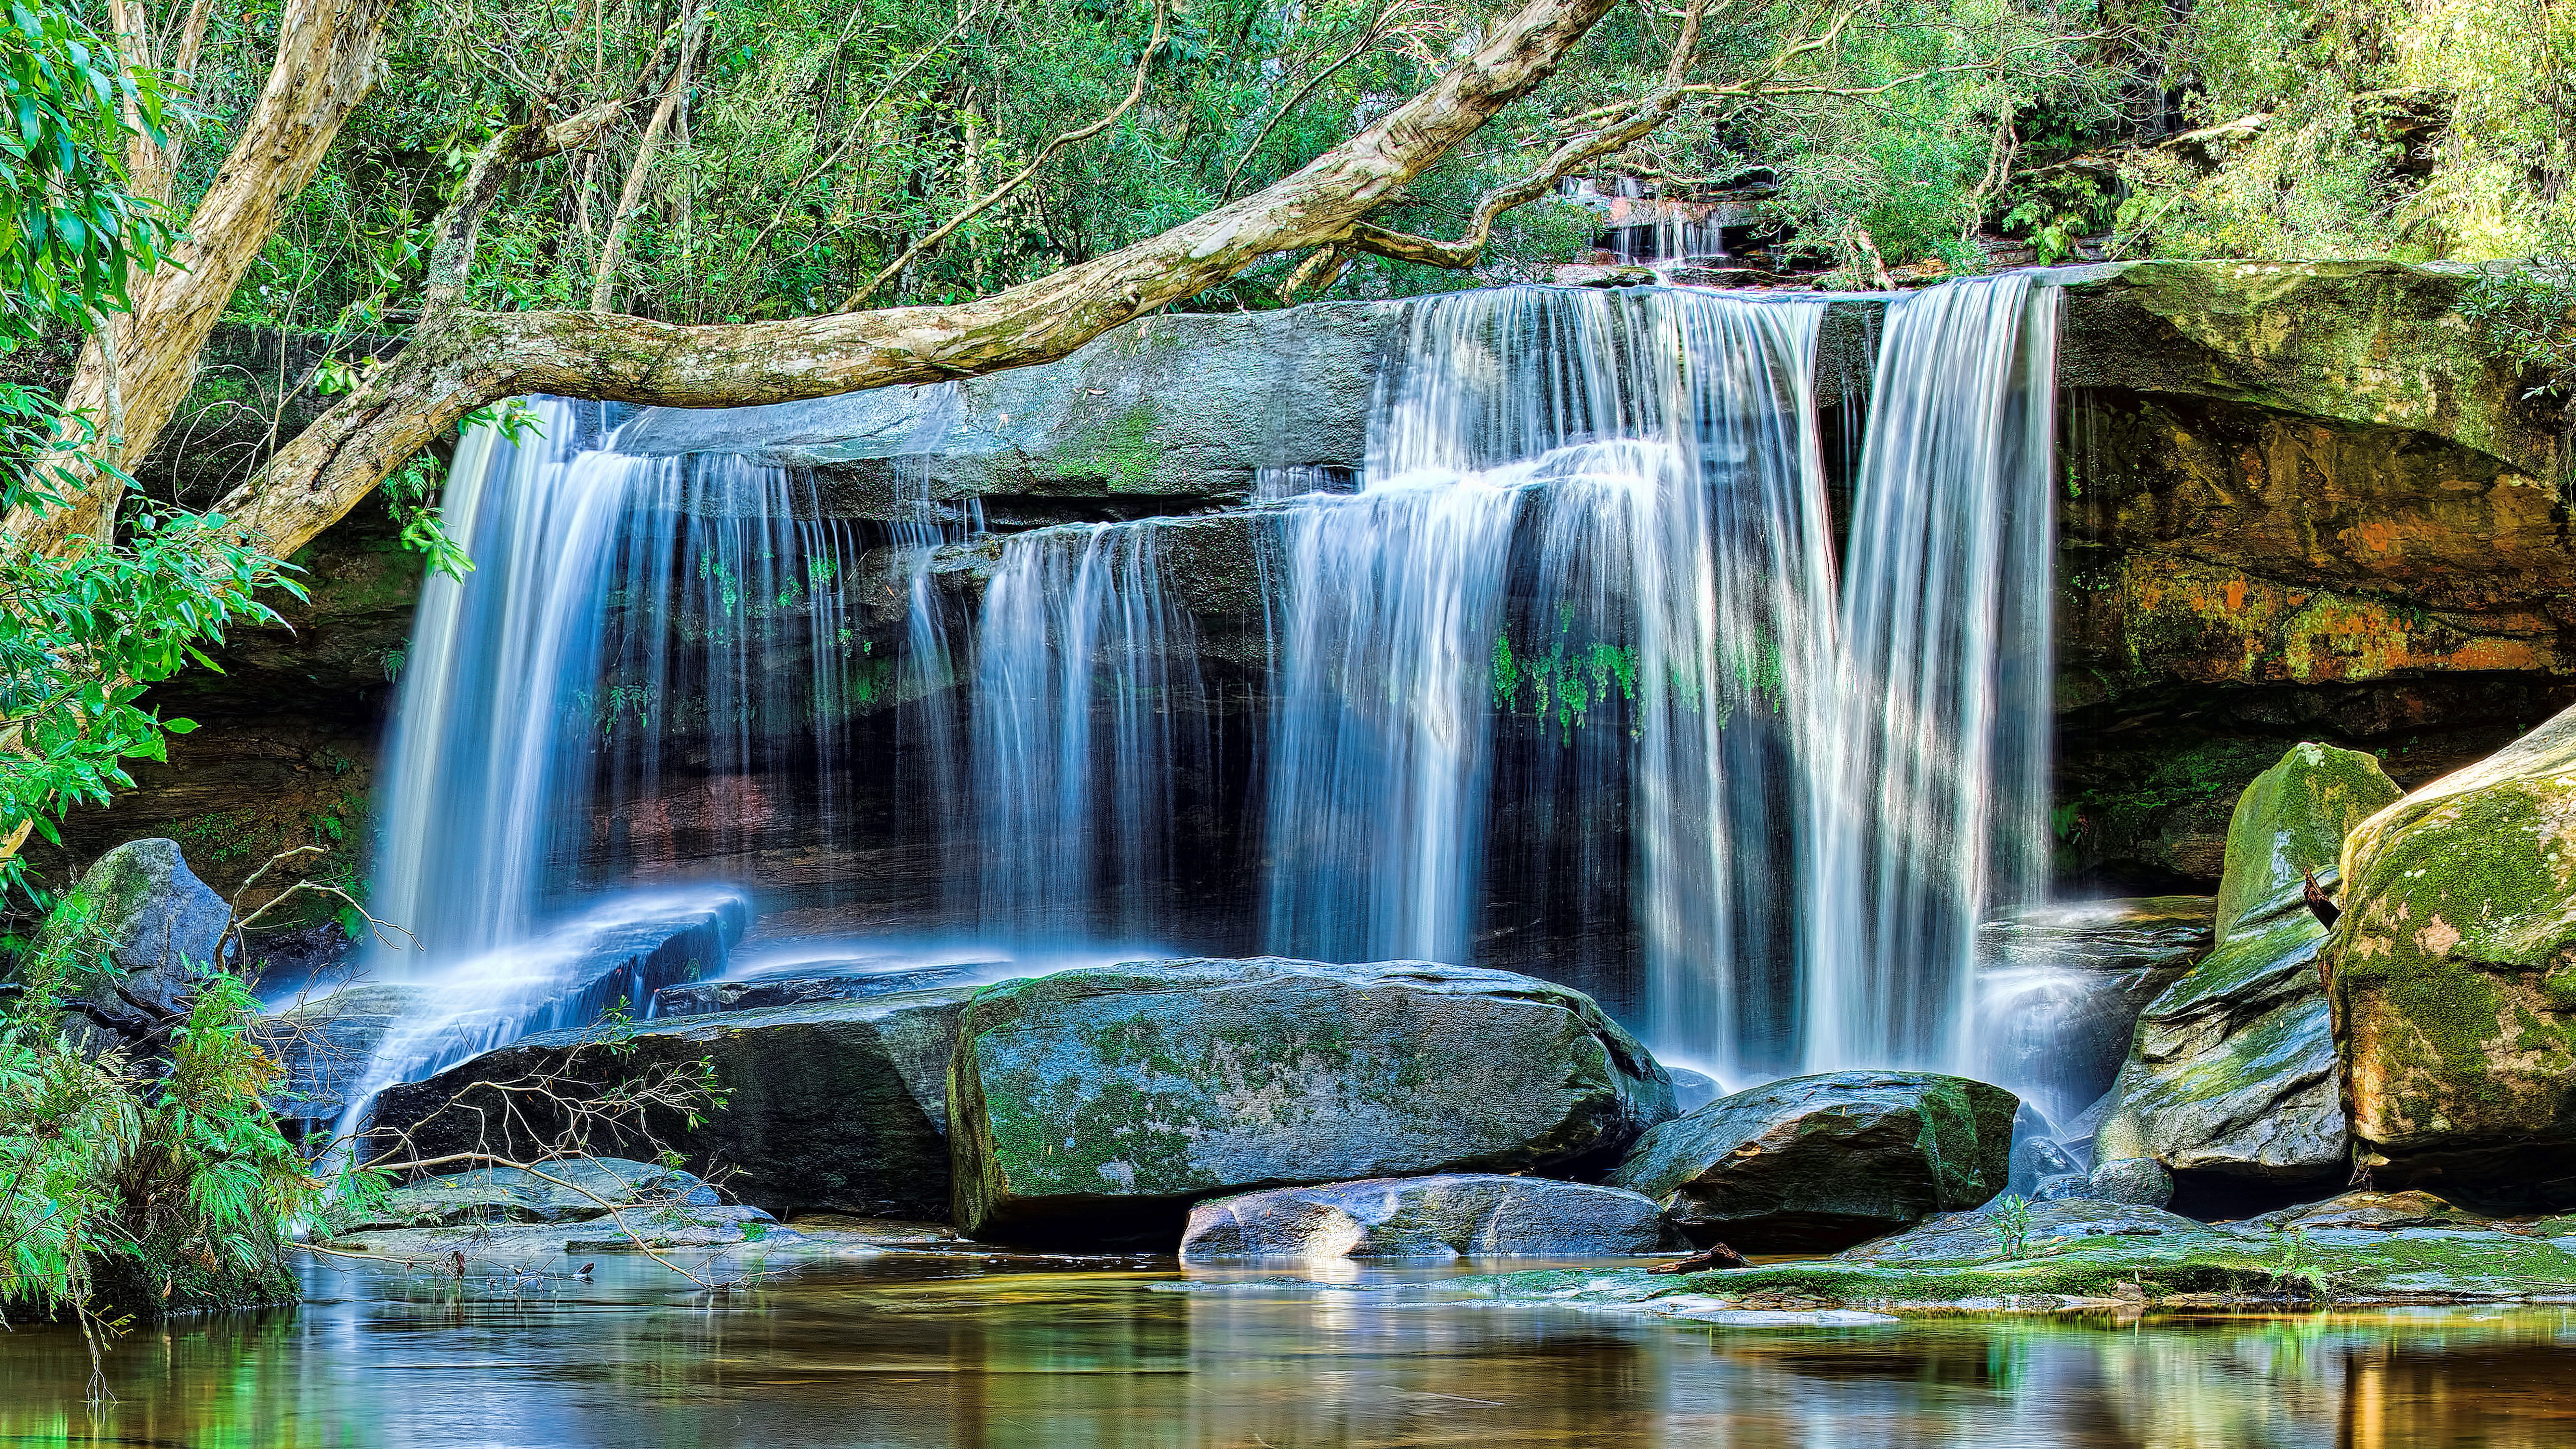 8k ultra hd nature waterfall wallpaper hd | uhd in 2019 | Waterfall wallpaper, Waterfall, Wallpaper